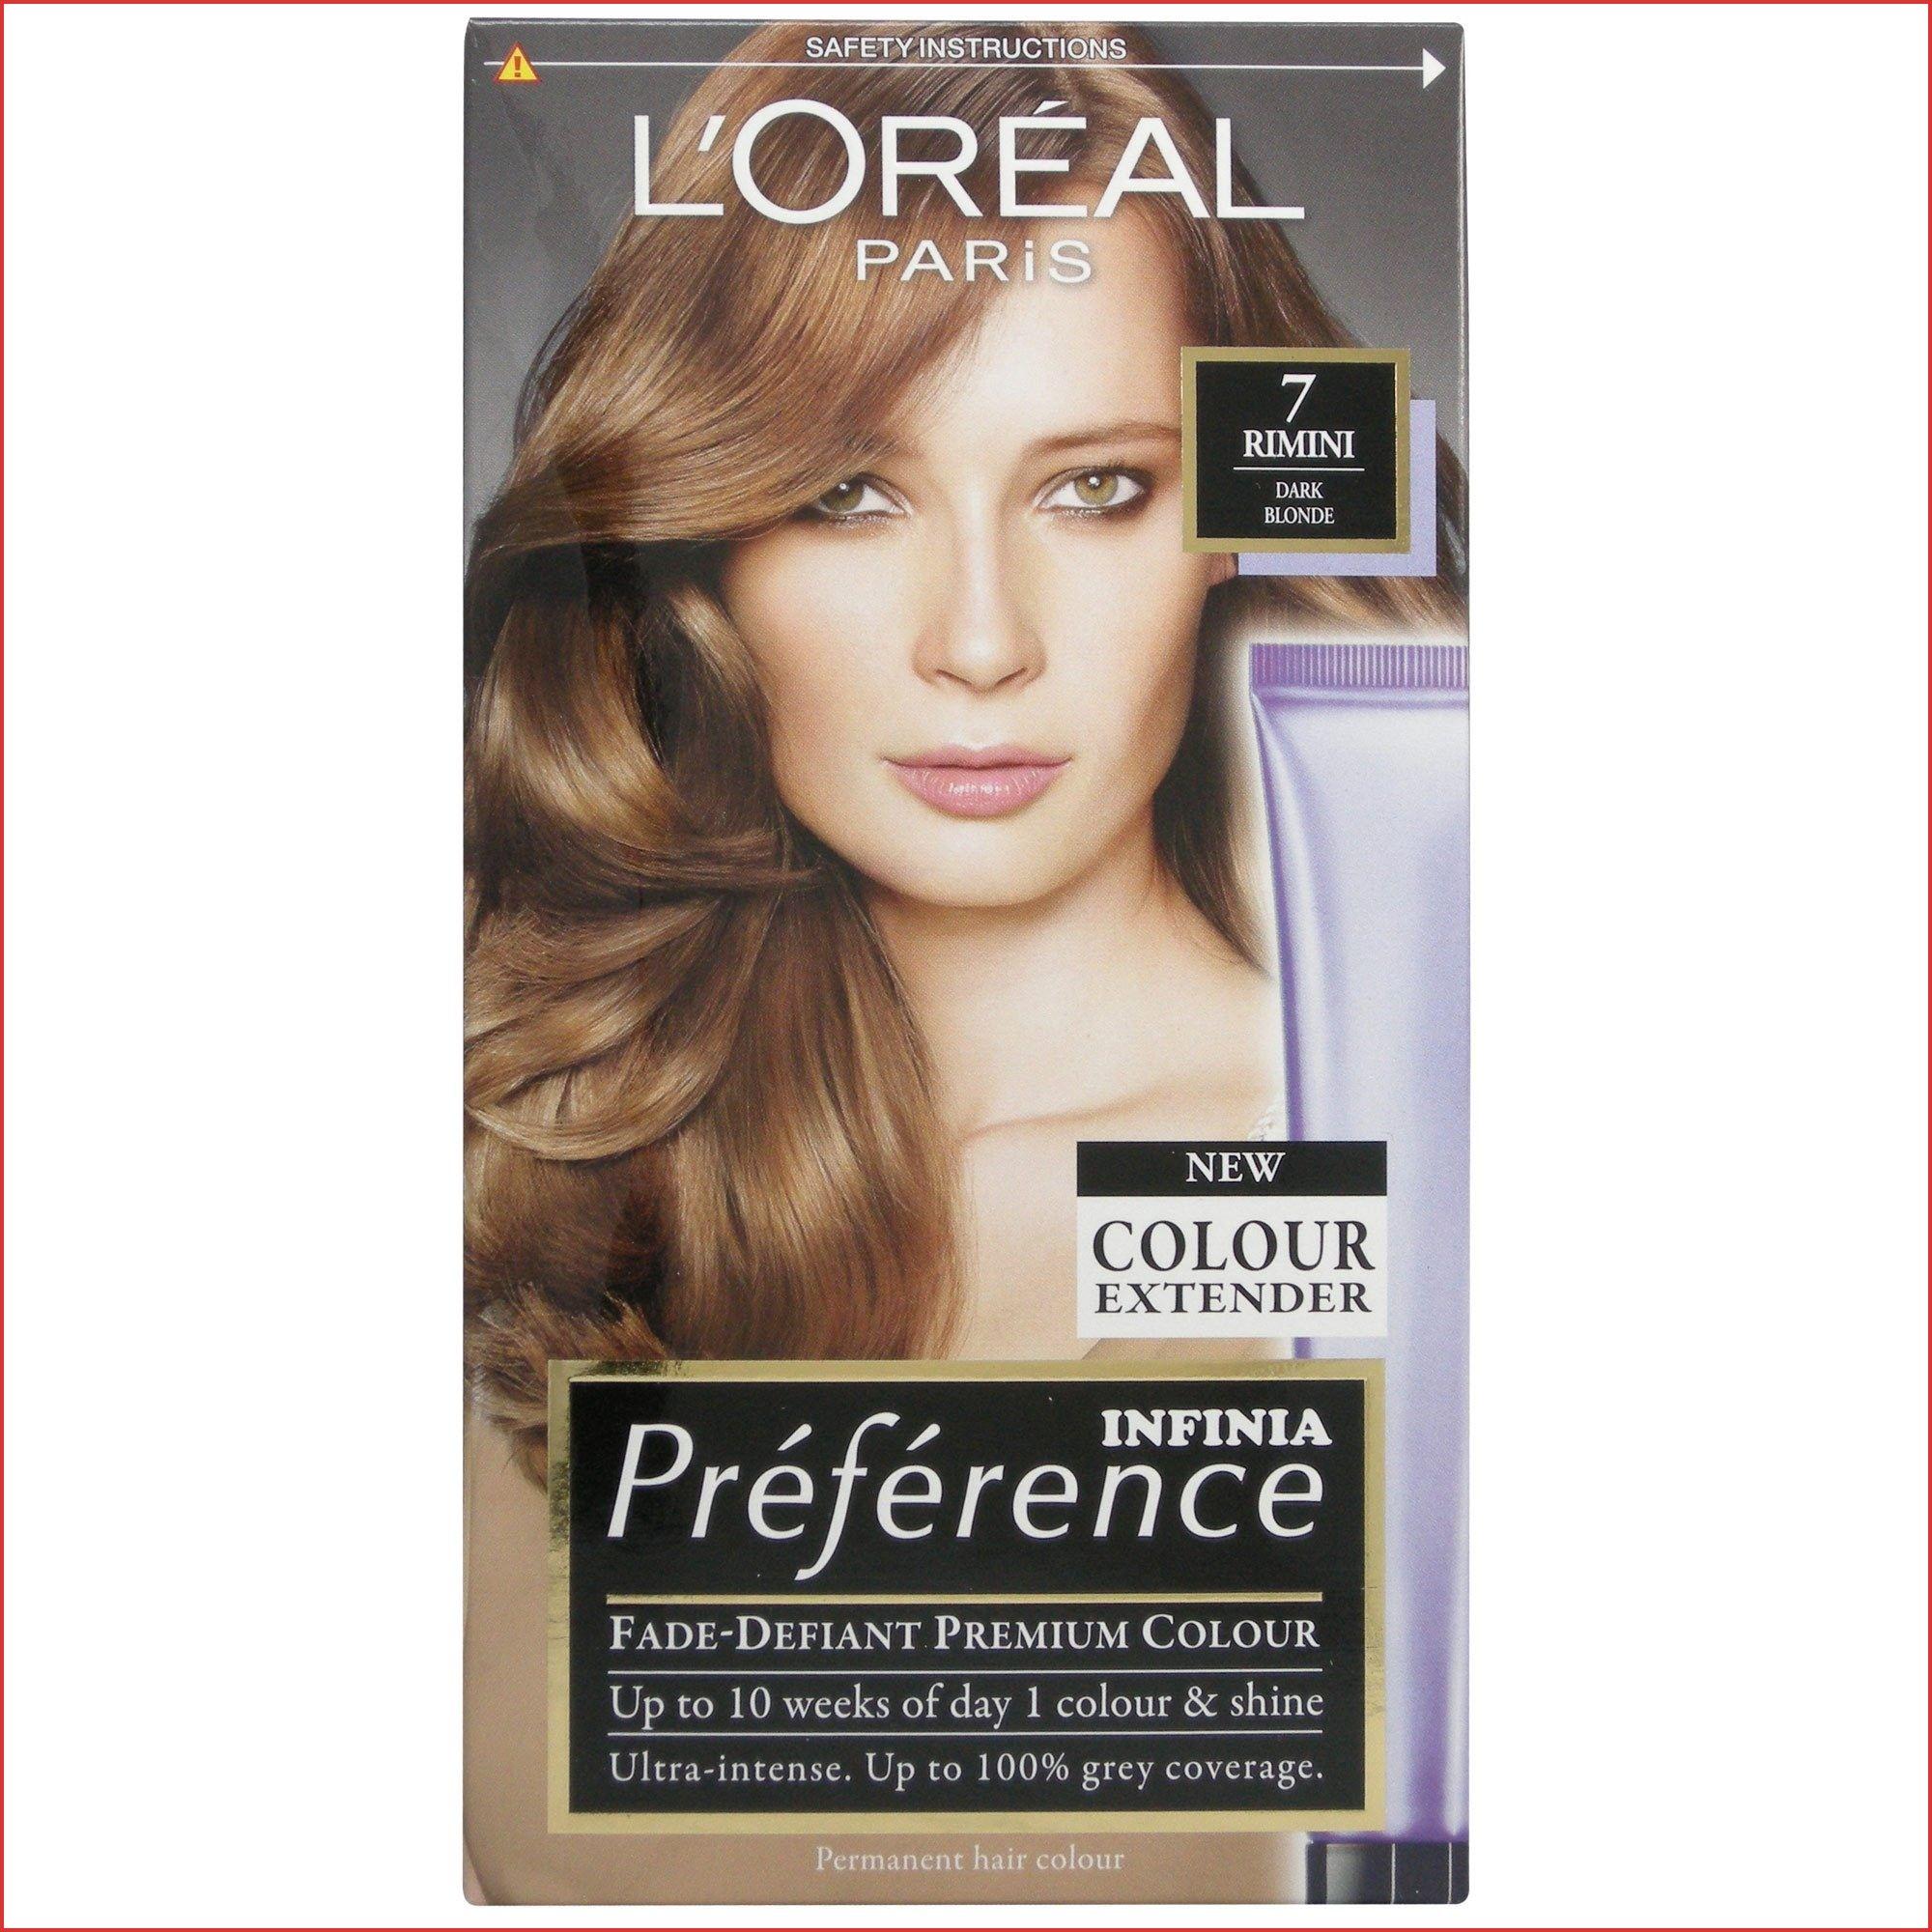 Loreal Preference Hair Color Instructions 154636 L Oreal Recital Preference 7 Rimini Dark Blo Loreal Preference Hair Color Dark Blonde Dyed Blonde Hair